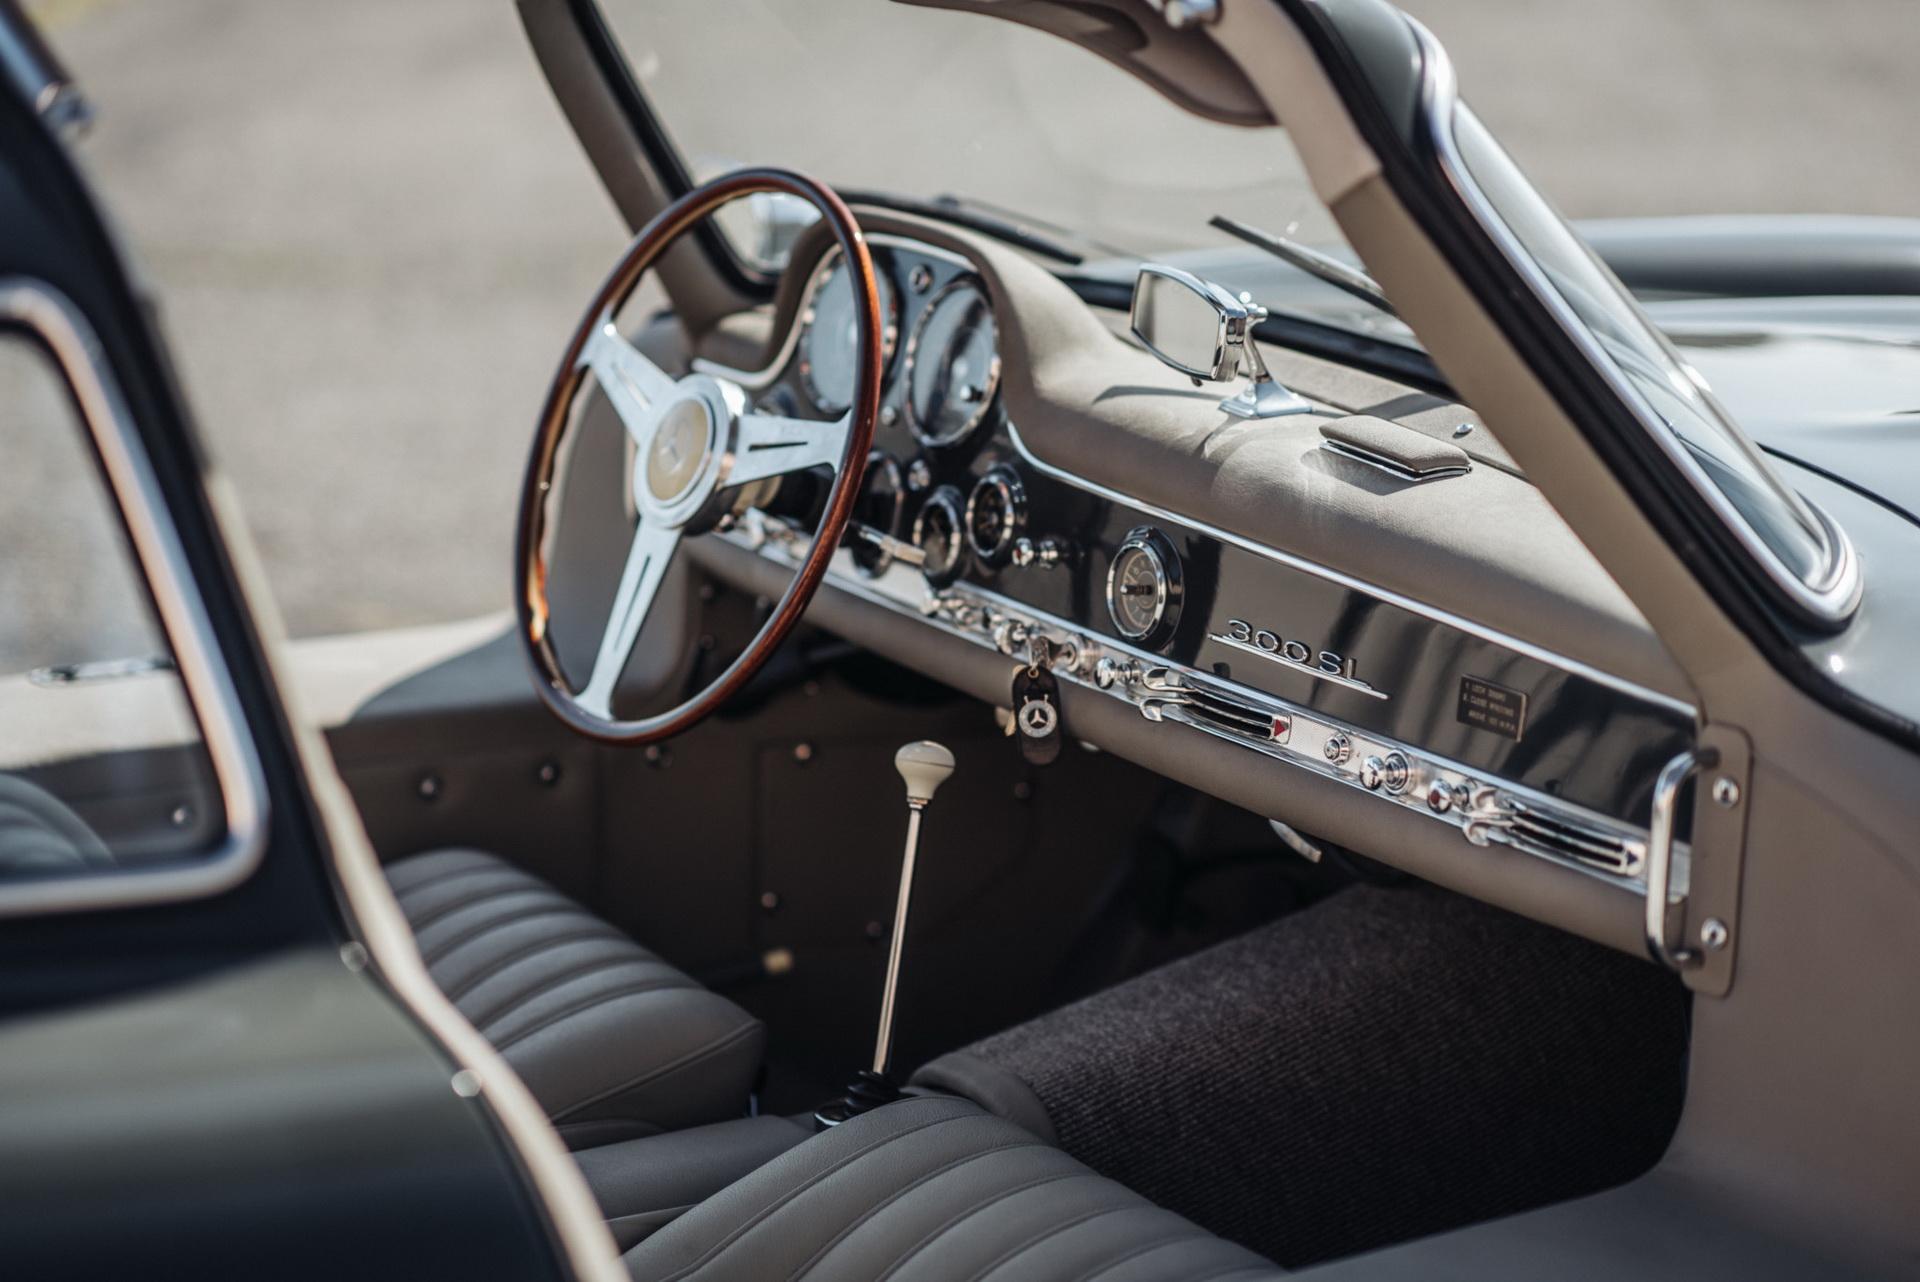 Mercedes-Benz 300SL Gullwing 1956 árverés